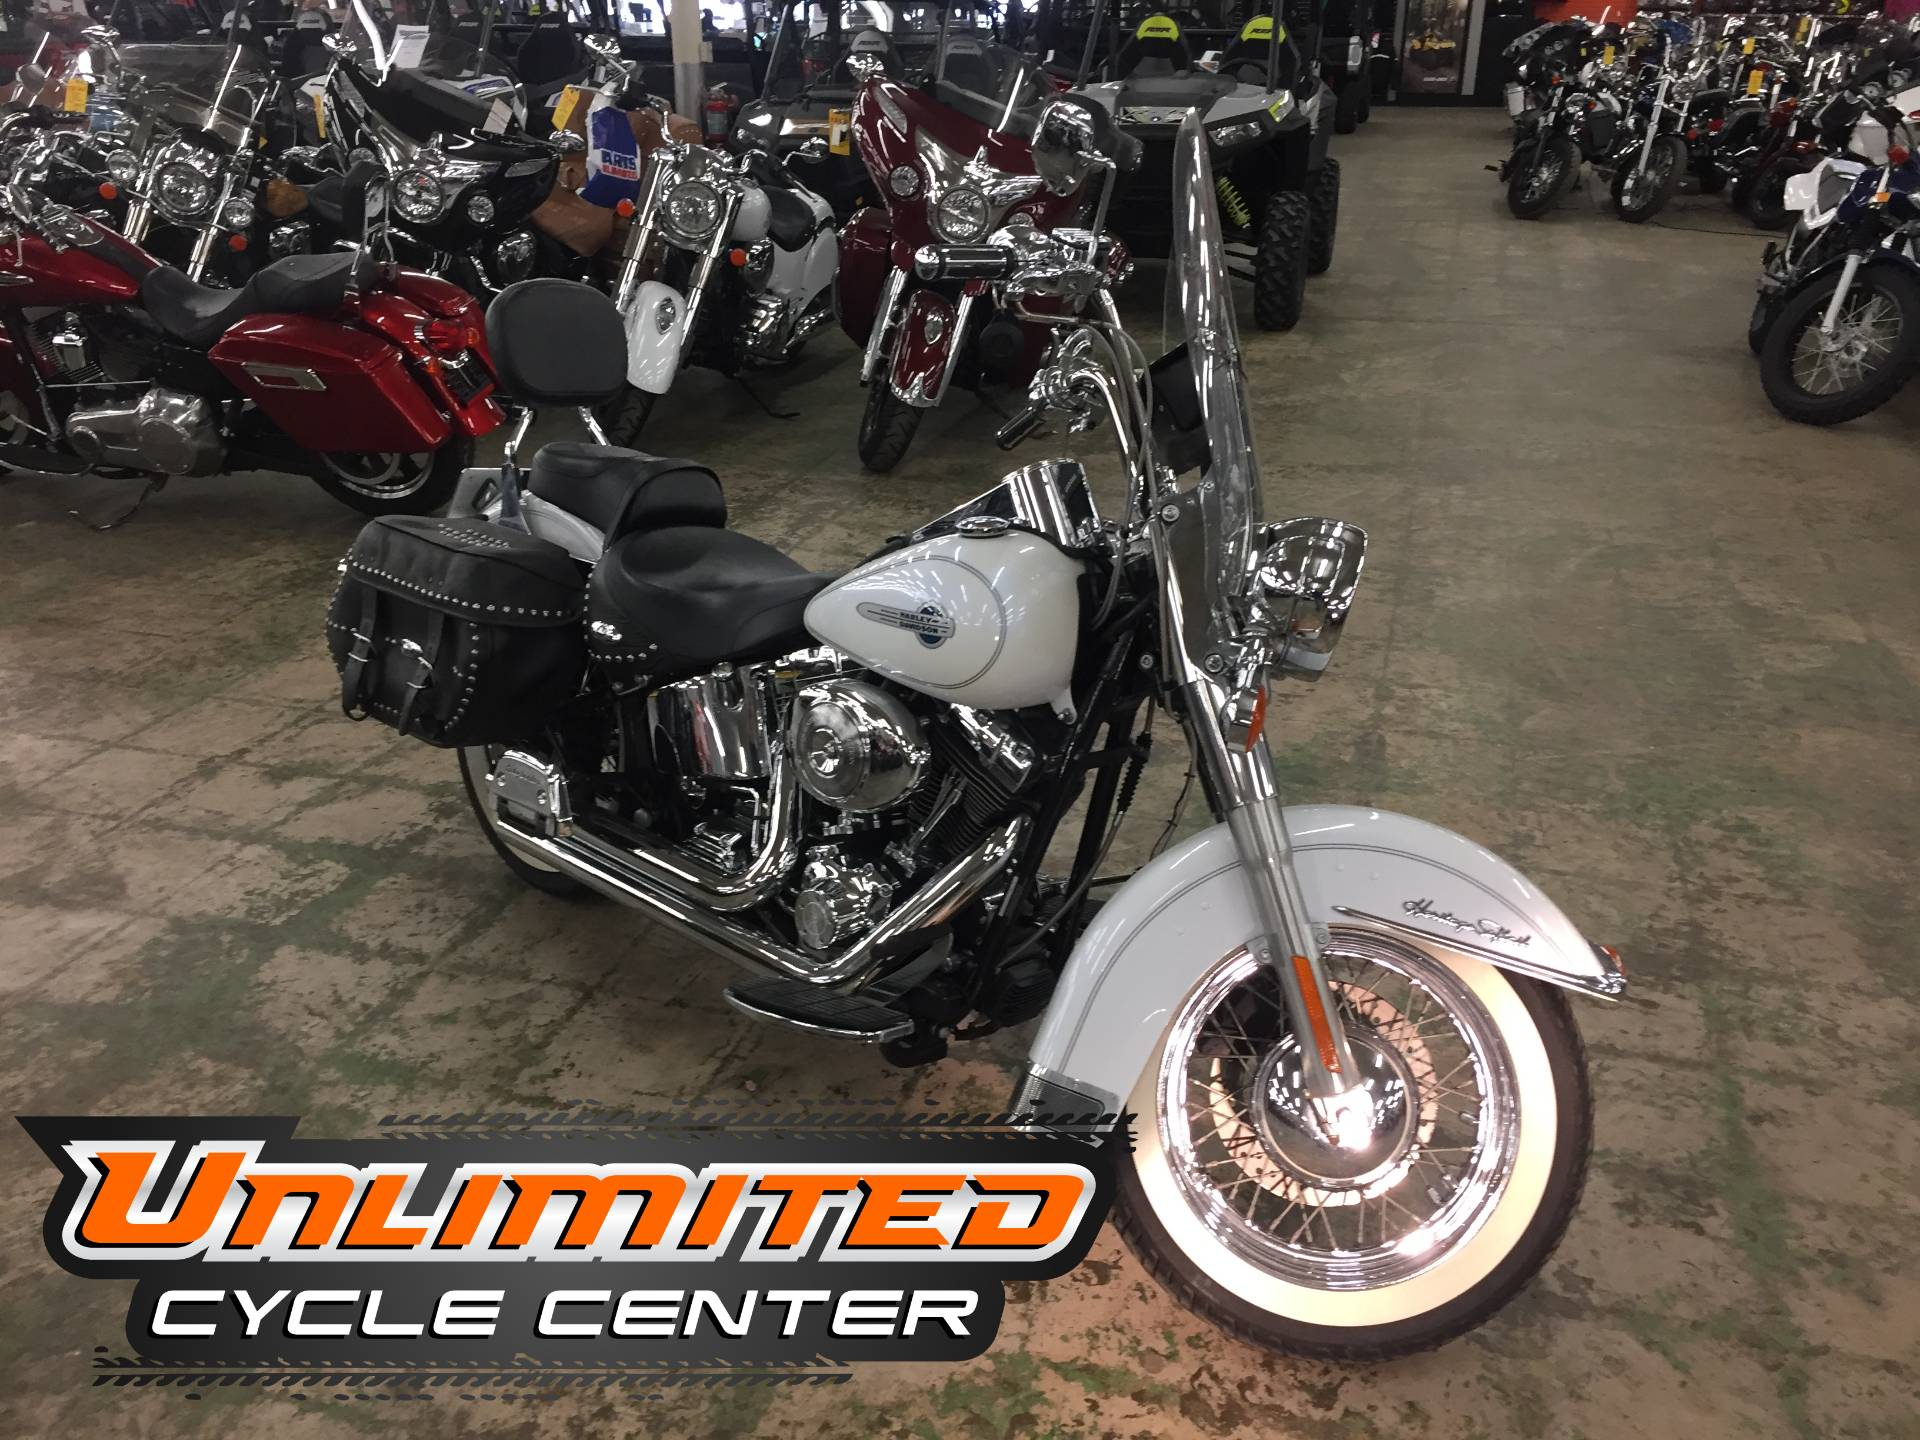 2004 Harley-Davidson FLSTC/FLSTCI Heritage Softail® Classic in Tyrone,  Pennsylvania